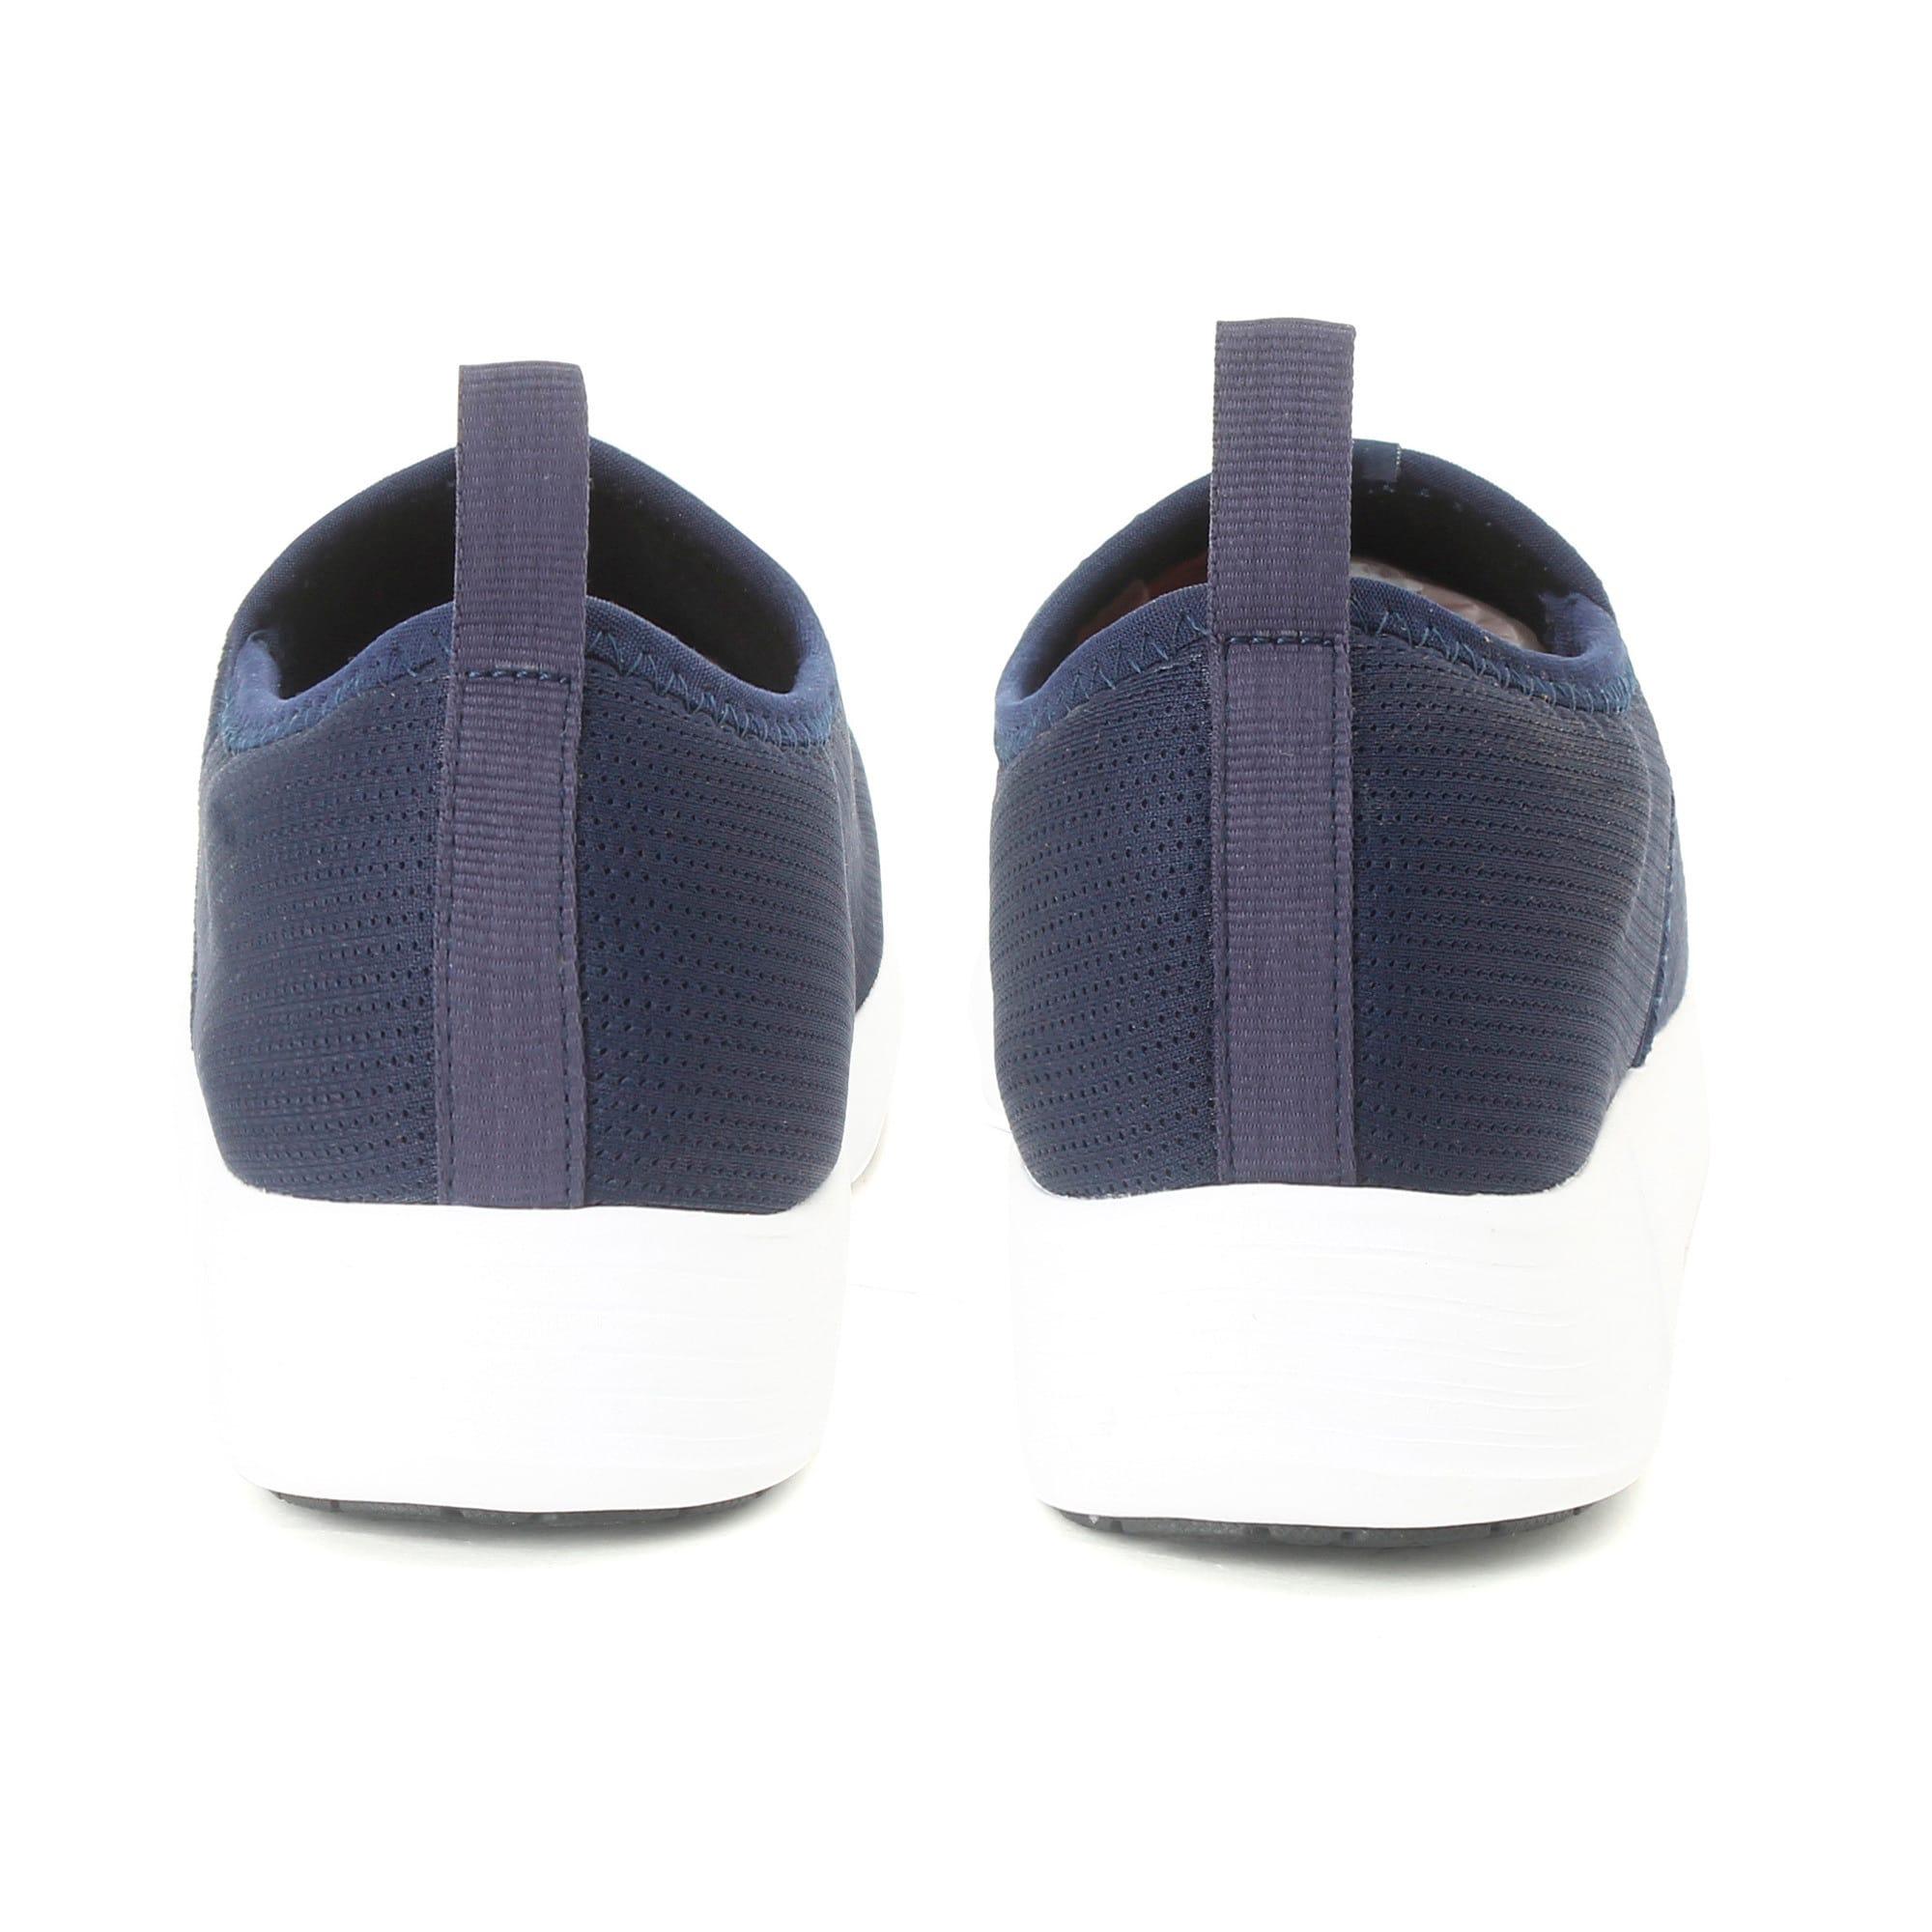 Thumbnail 3 of ST Comfort IDP Men's Sportstyle Shoes, Peacoat-Puma White, medium-IND